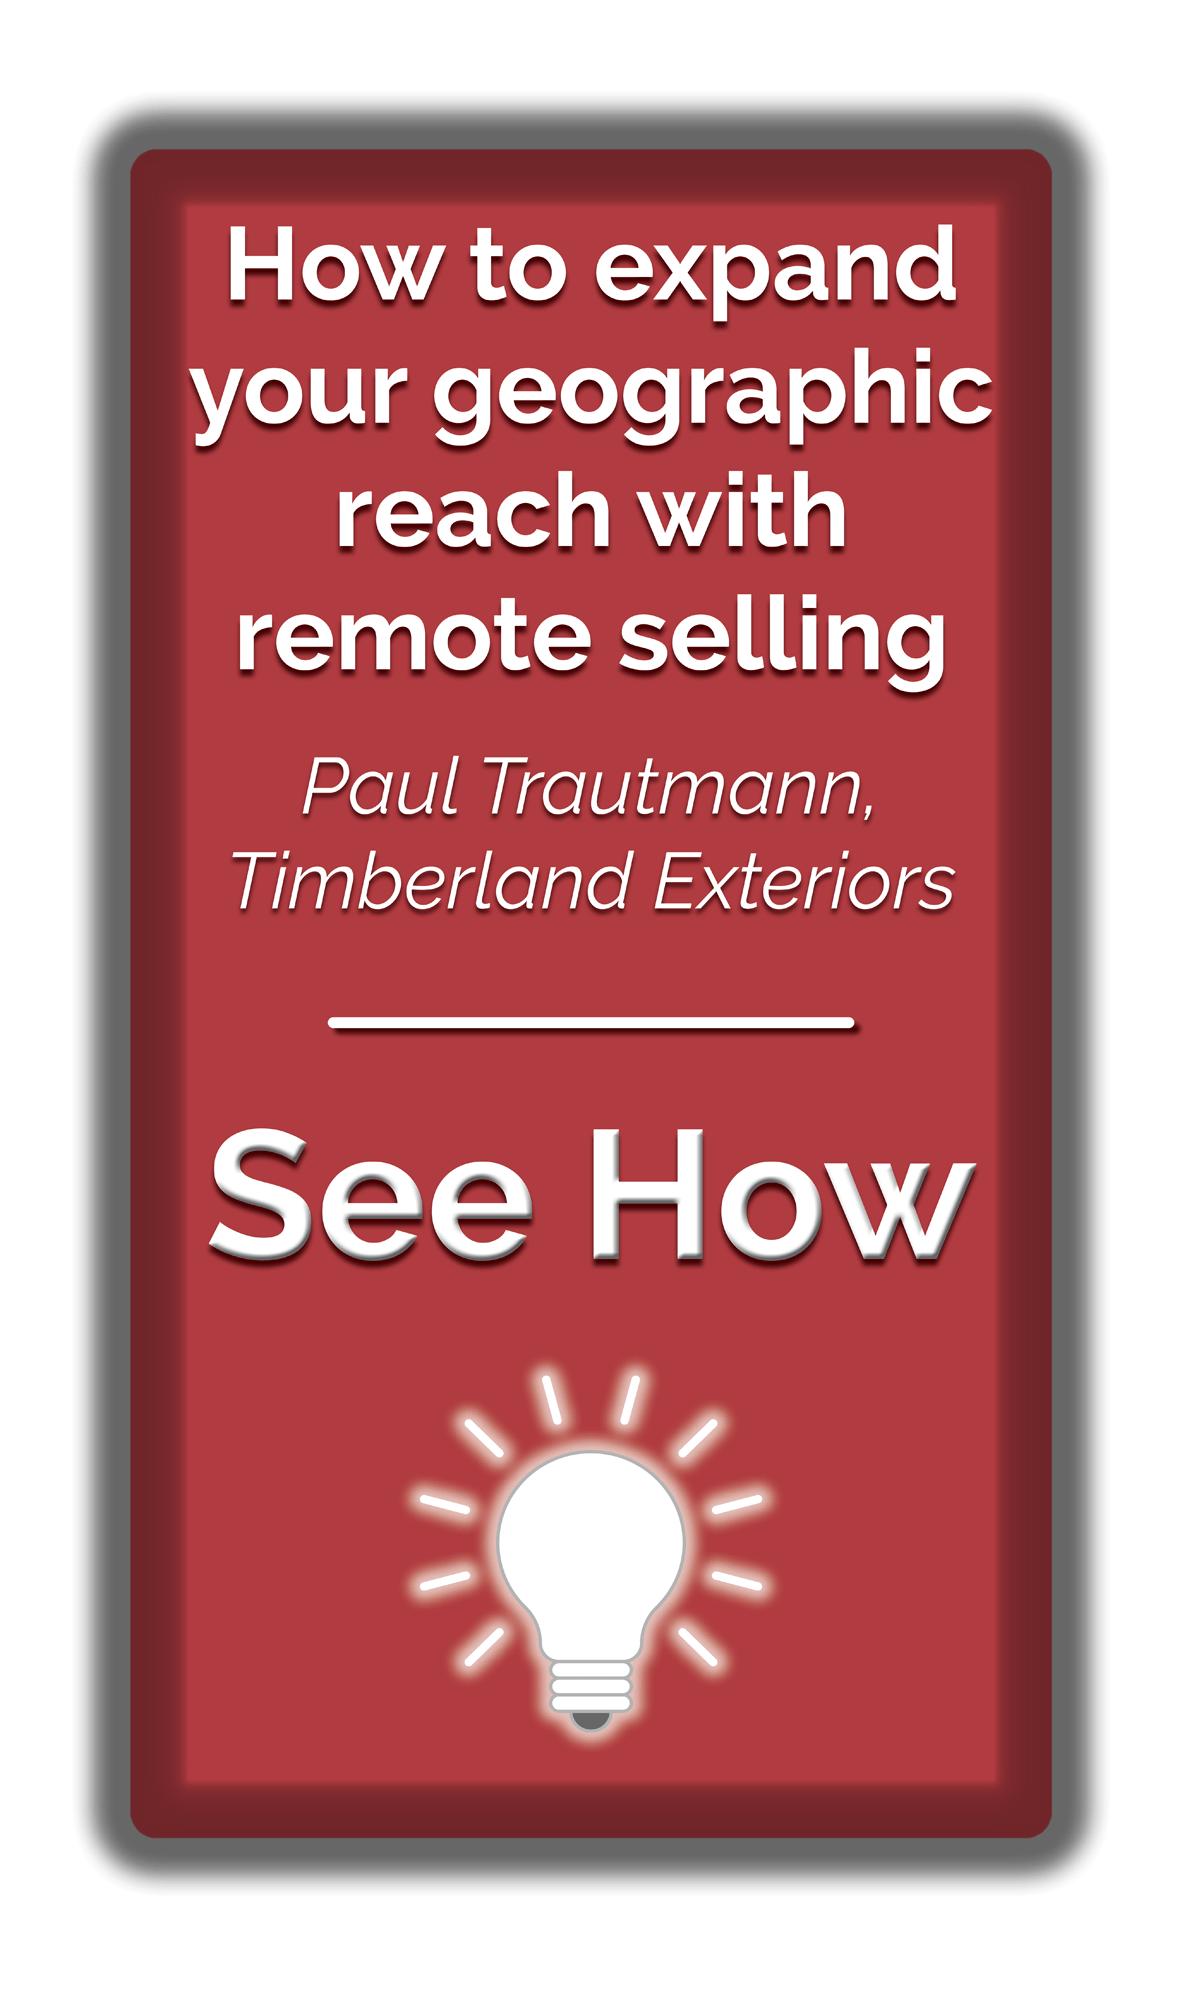 How-Yo-Expand-Paul-Trautmann-Button